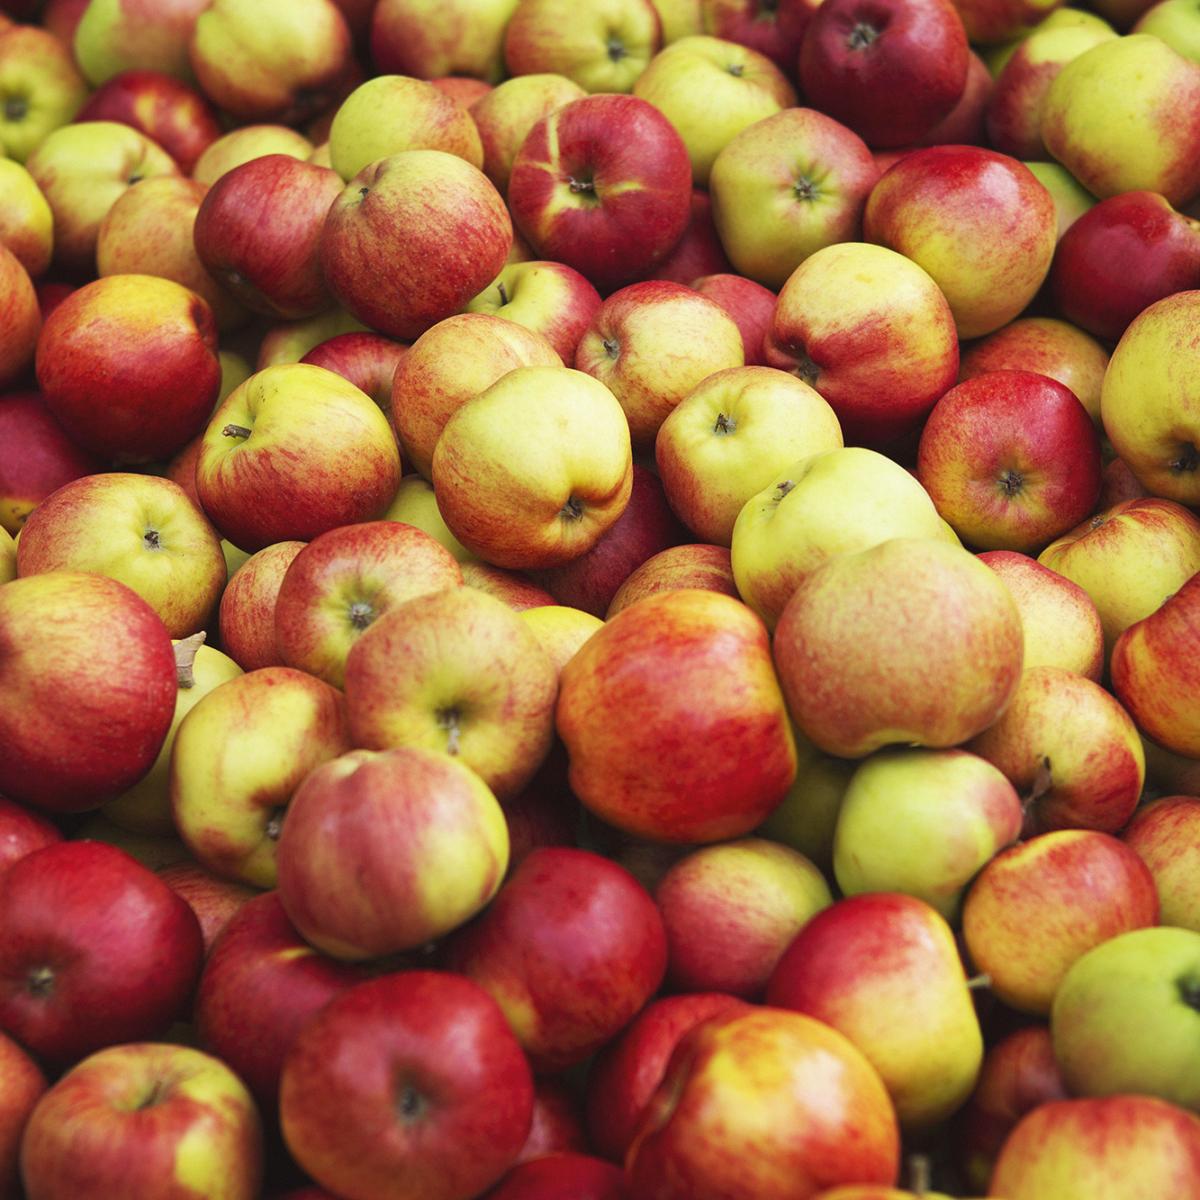 äpple juleboda gård fotograf anki blomqvist